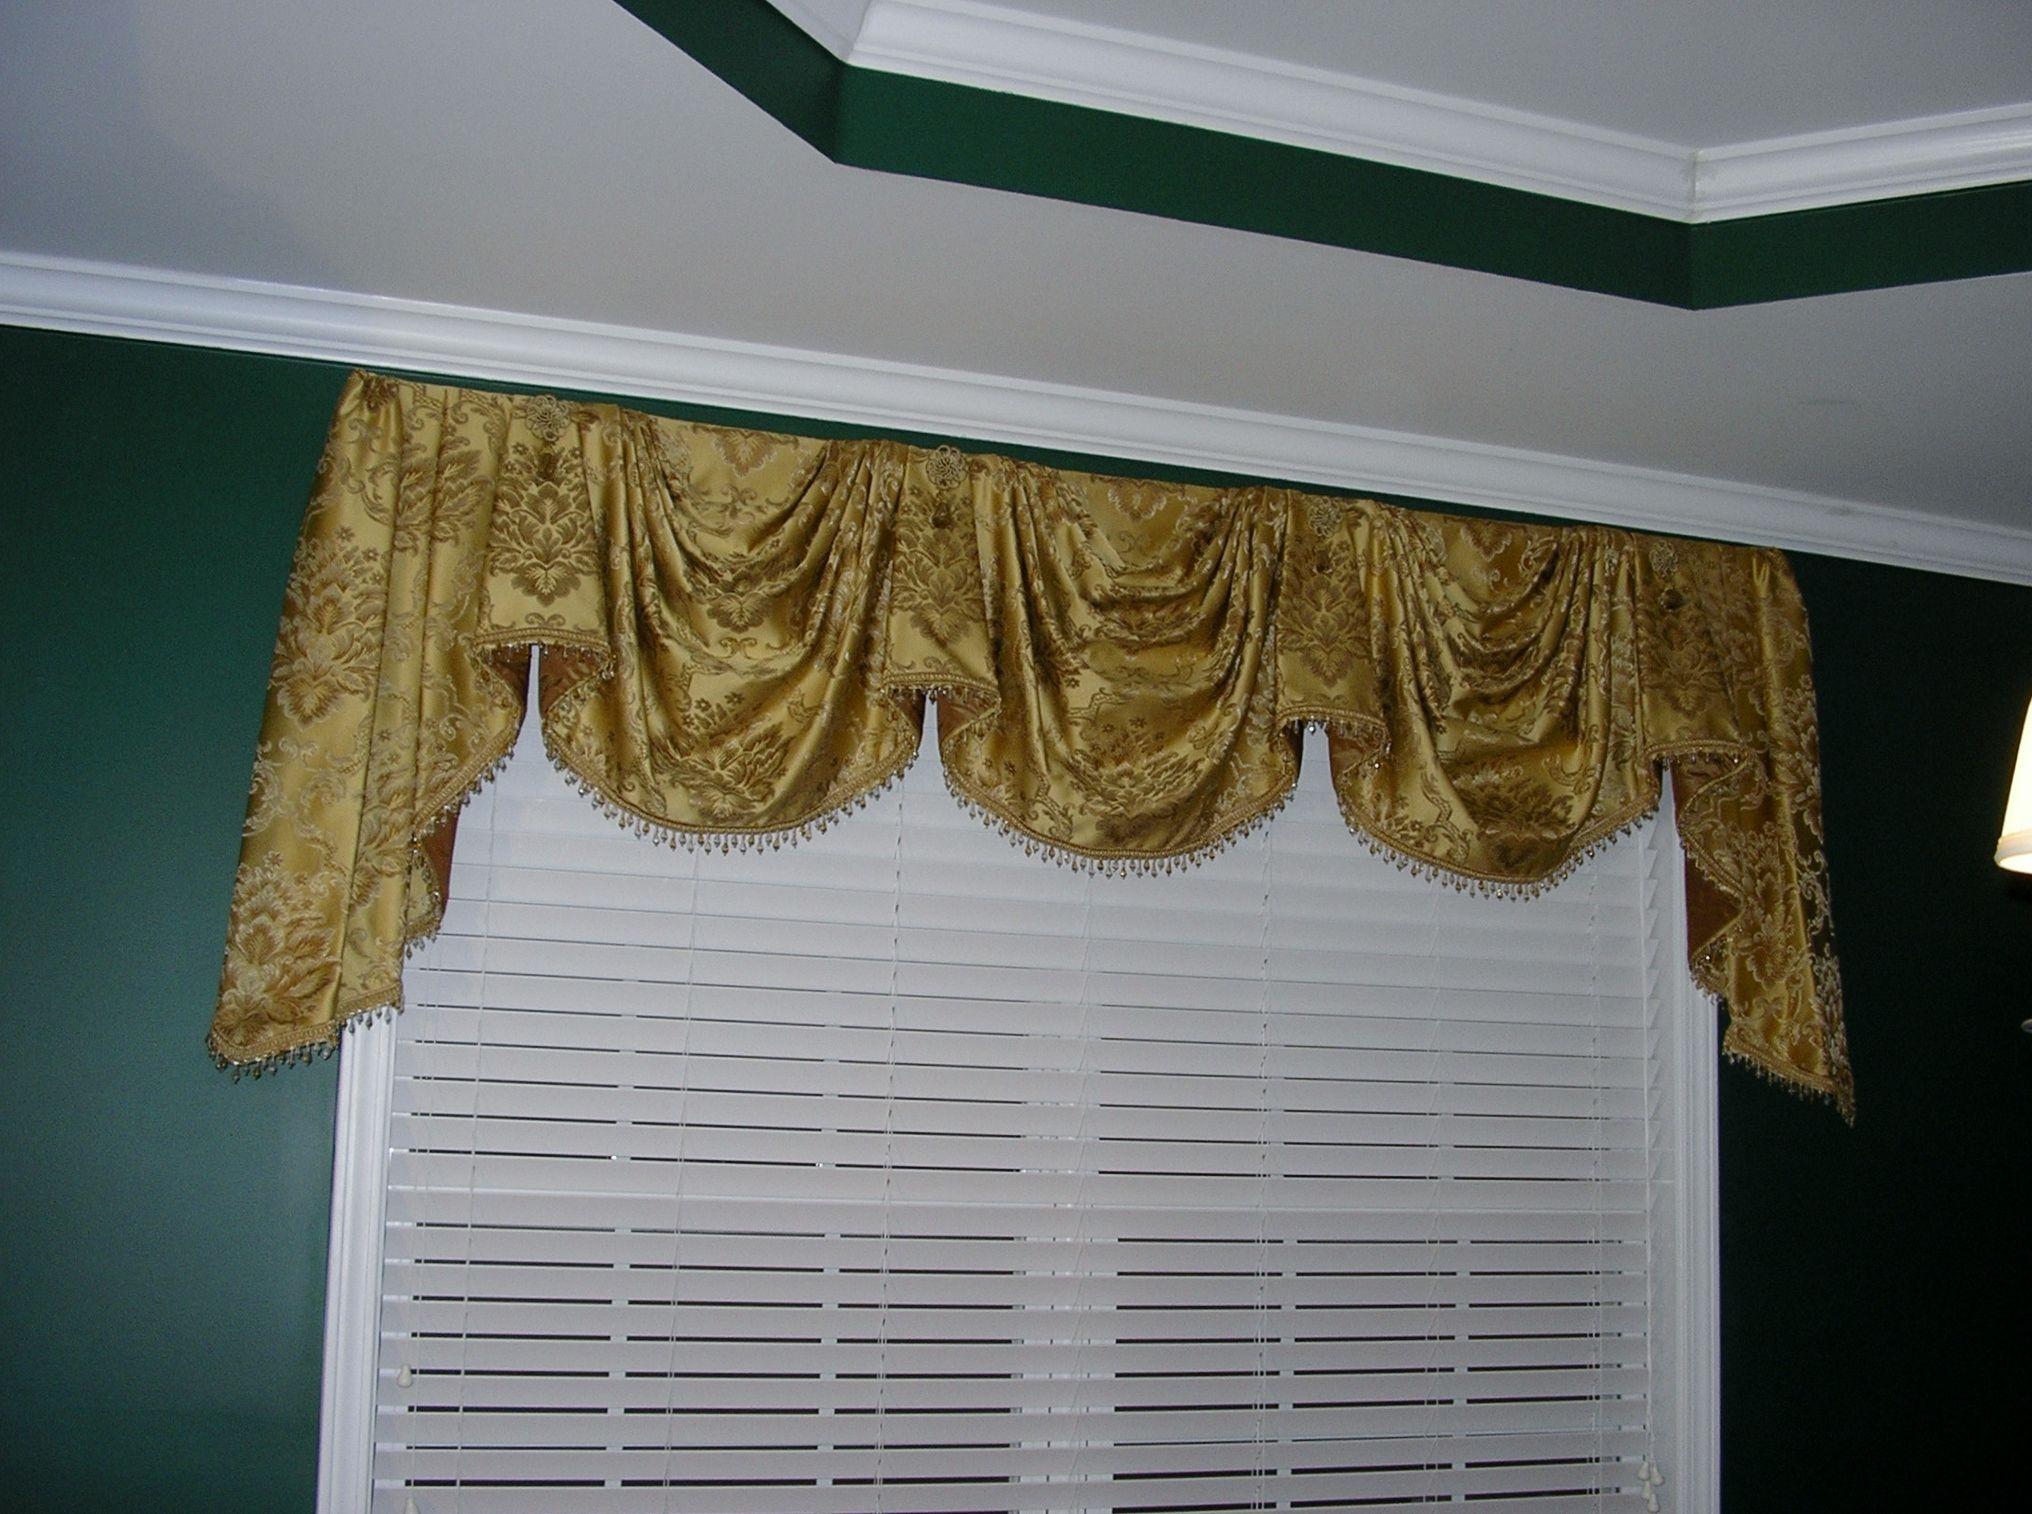 M Fay Pattern Home Decor Decor Valance Curtains